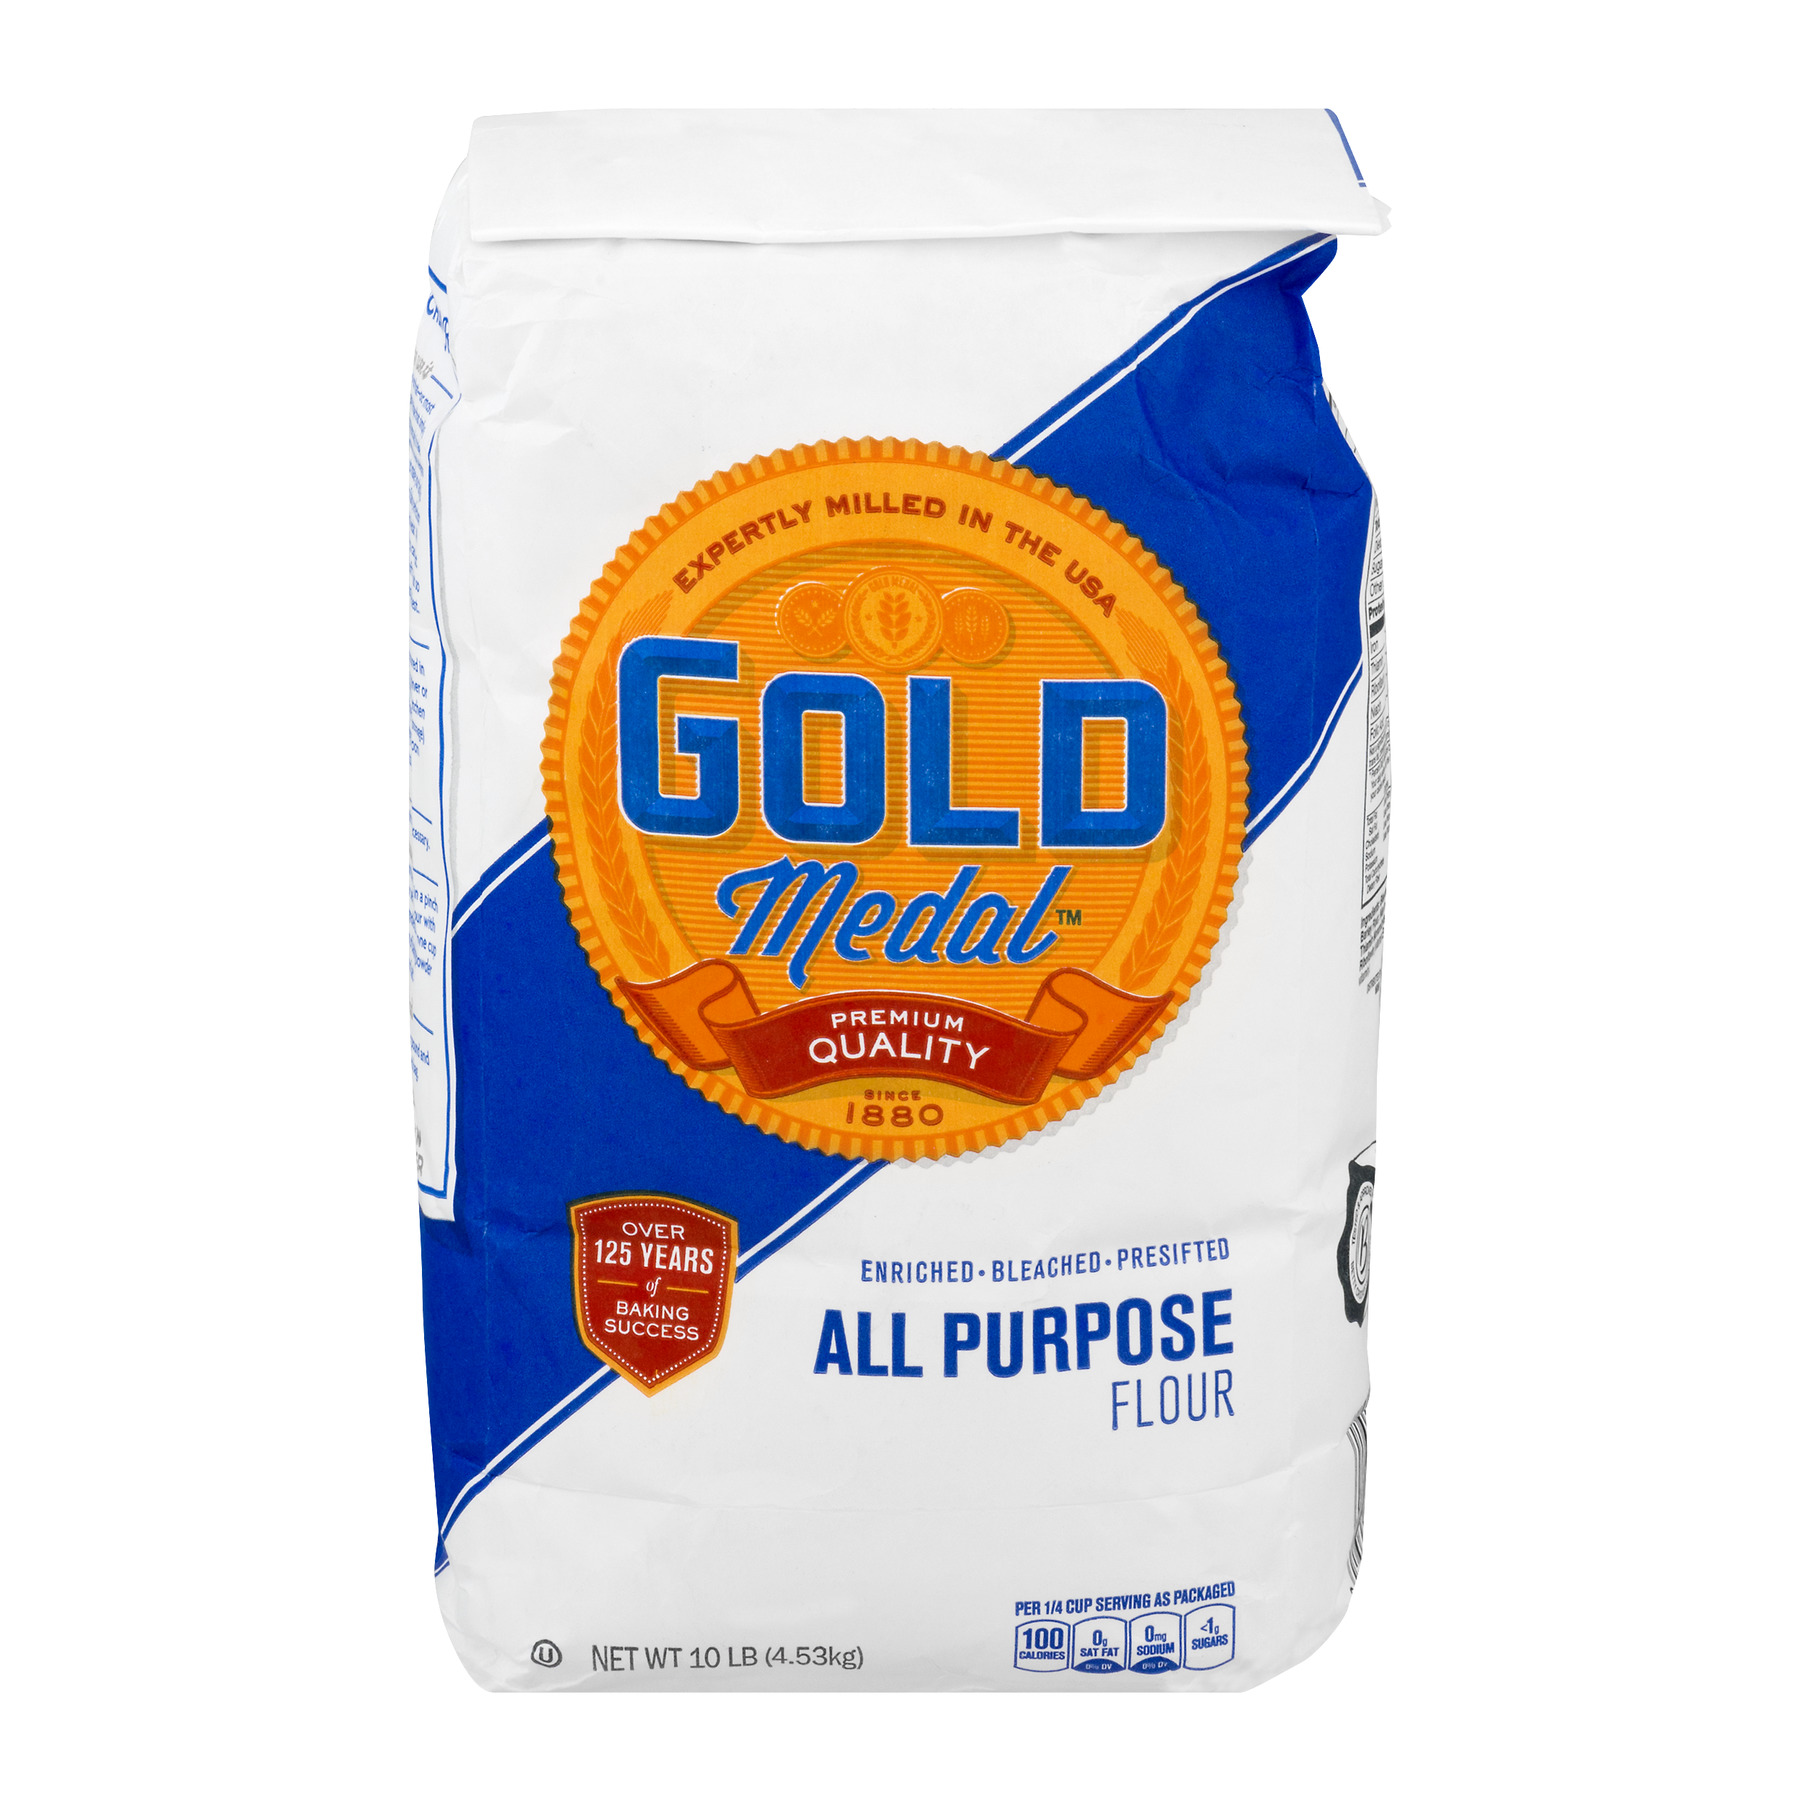 Gold Medal All-Purpose Flour, 10 lb Bag